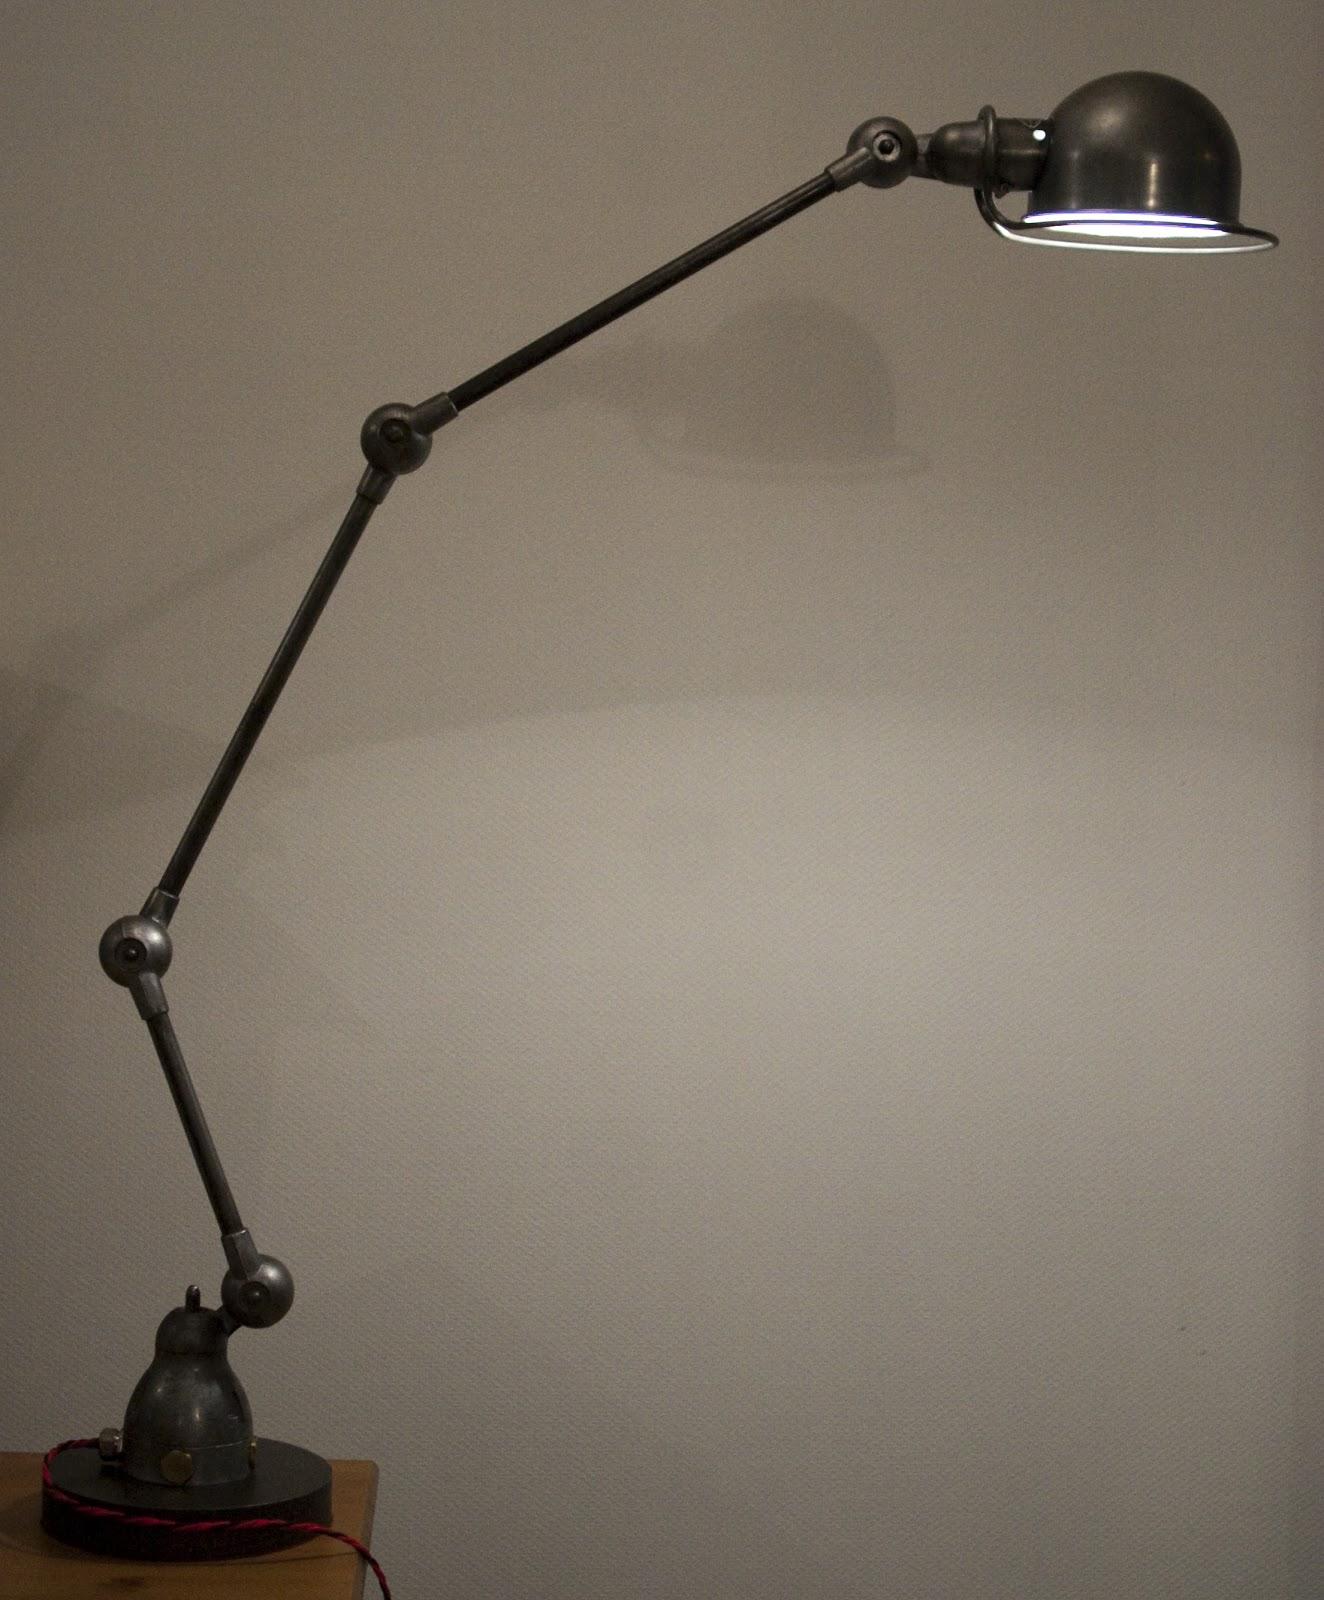 frank b 06 nouvelle lampe jielde 3 bras sur pied lourd. Black Bedroom Furniture Sets. Home Design Ideas